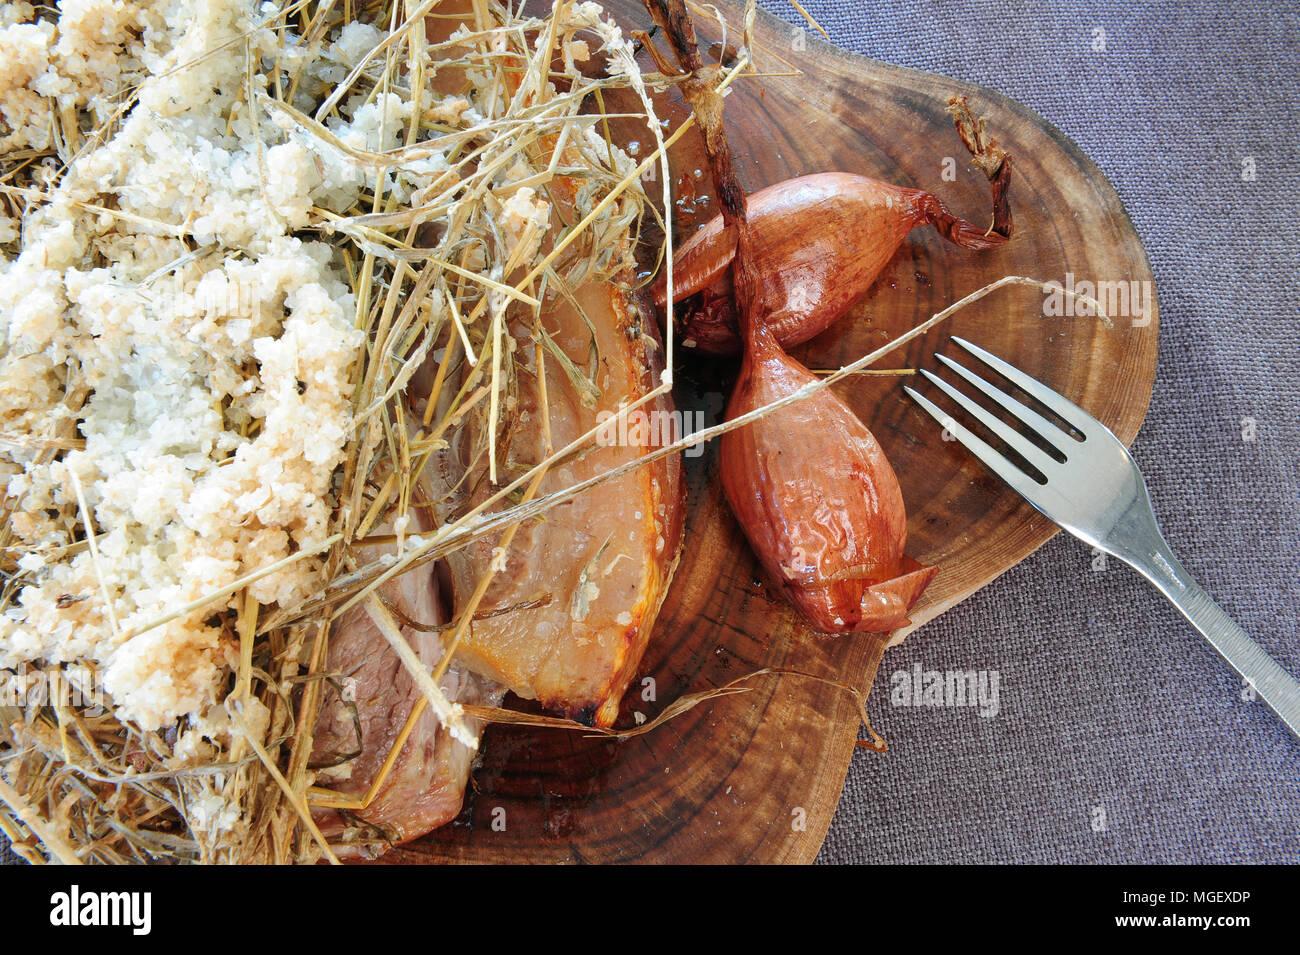 Caramelised Pork Chop With Cherrueix Shallots From La Table Du